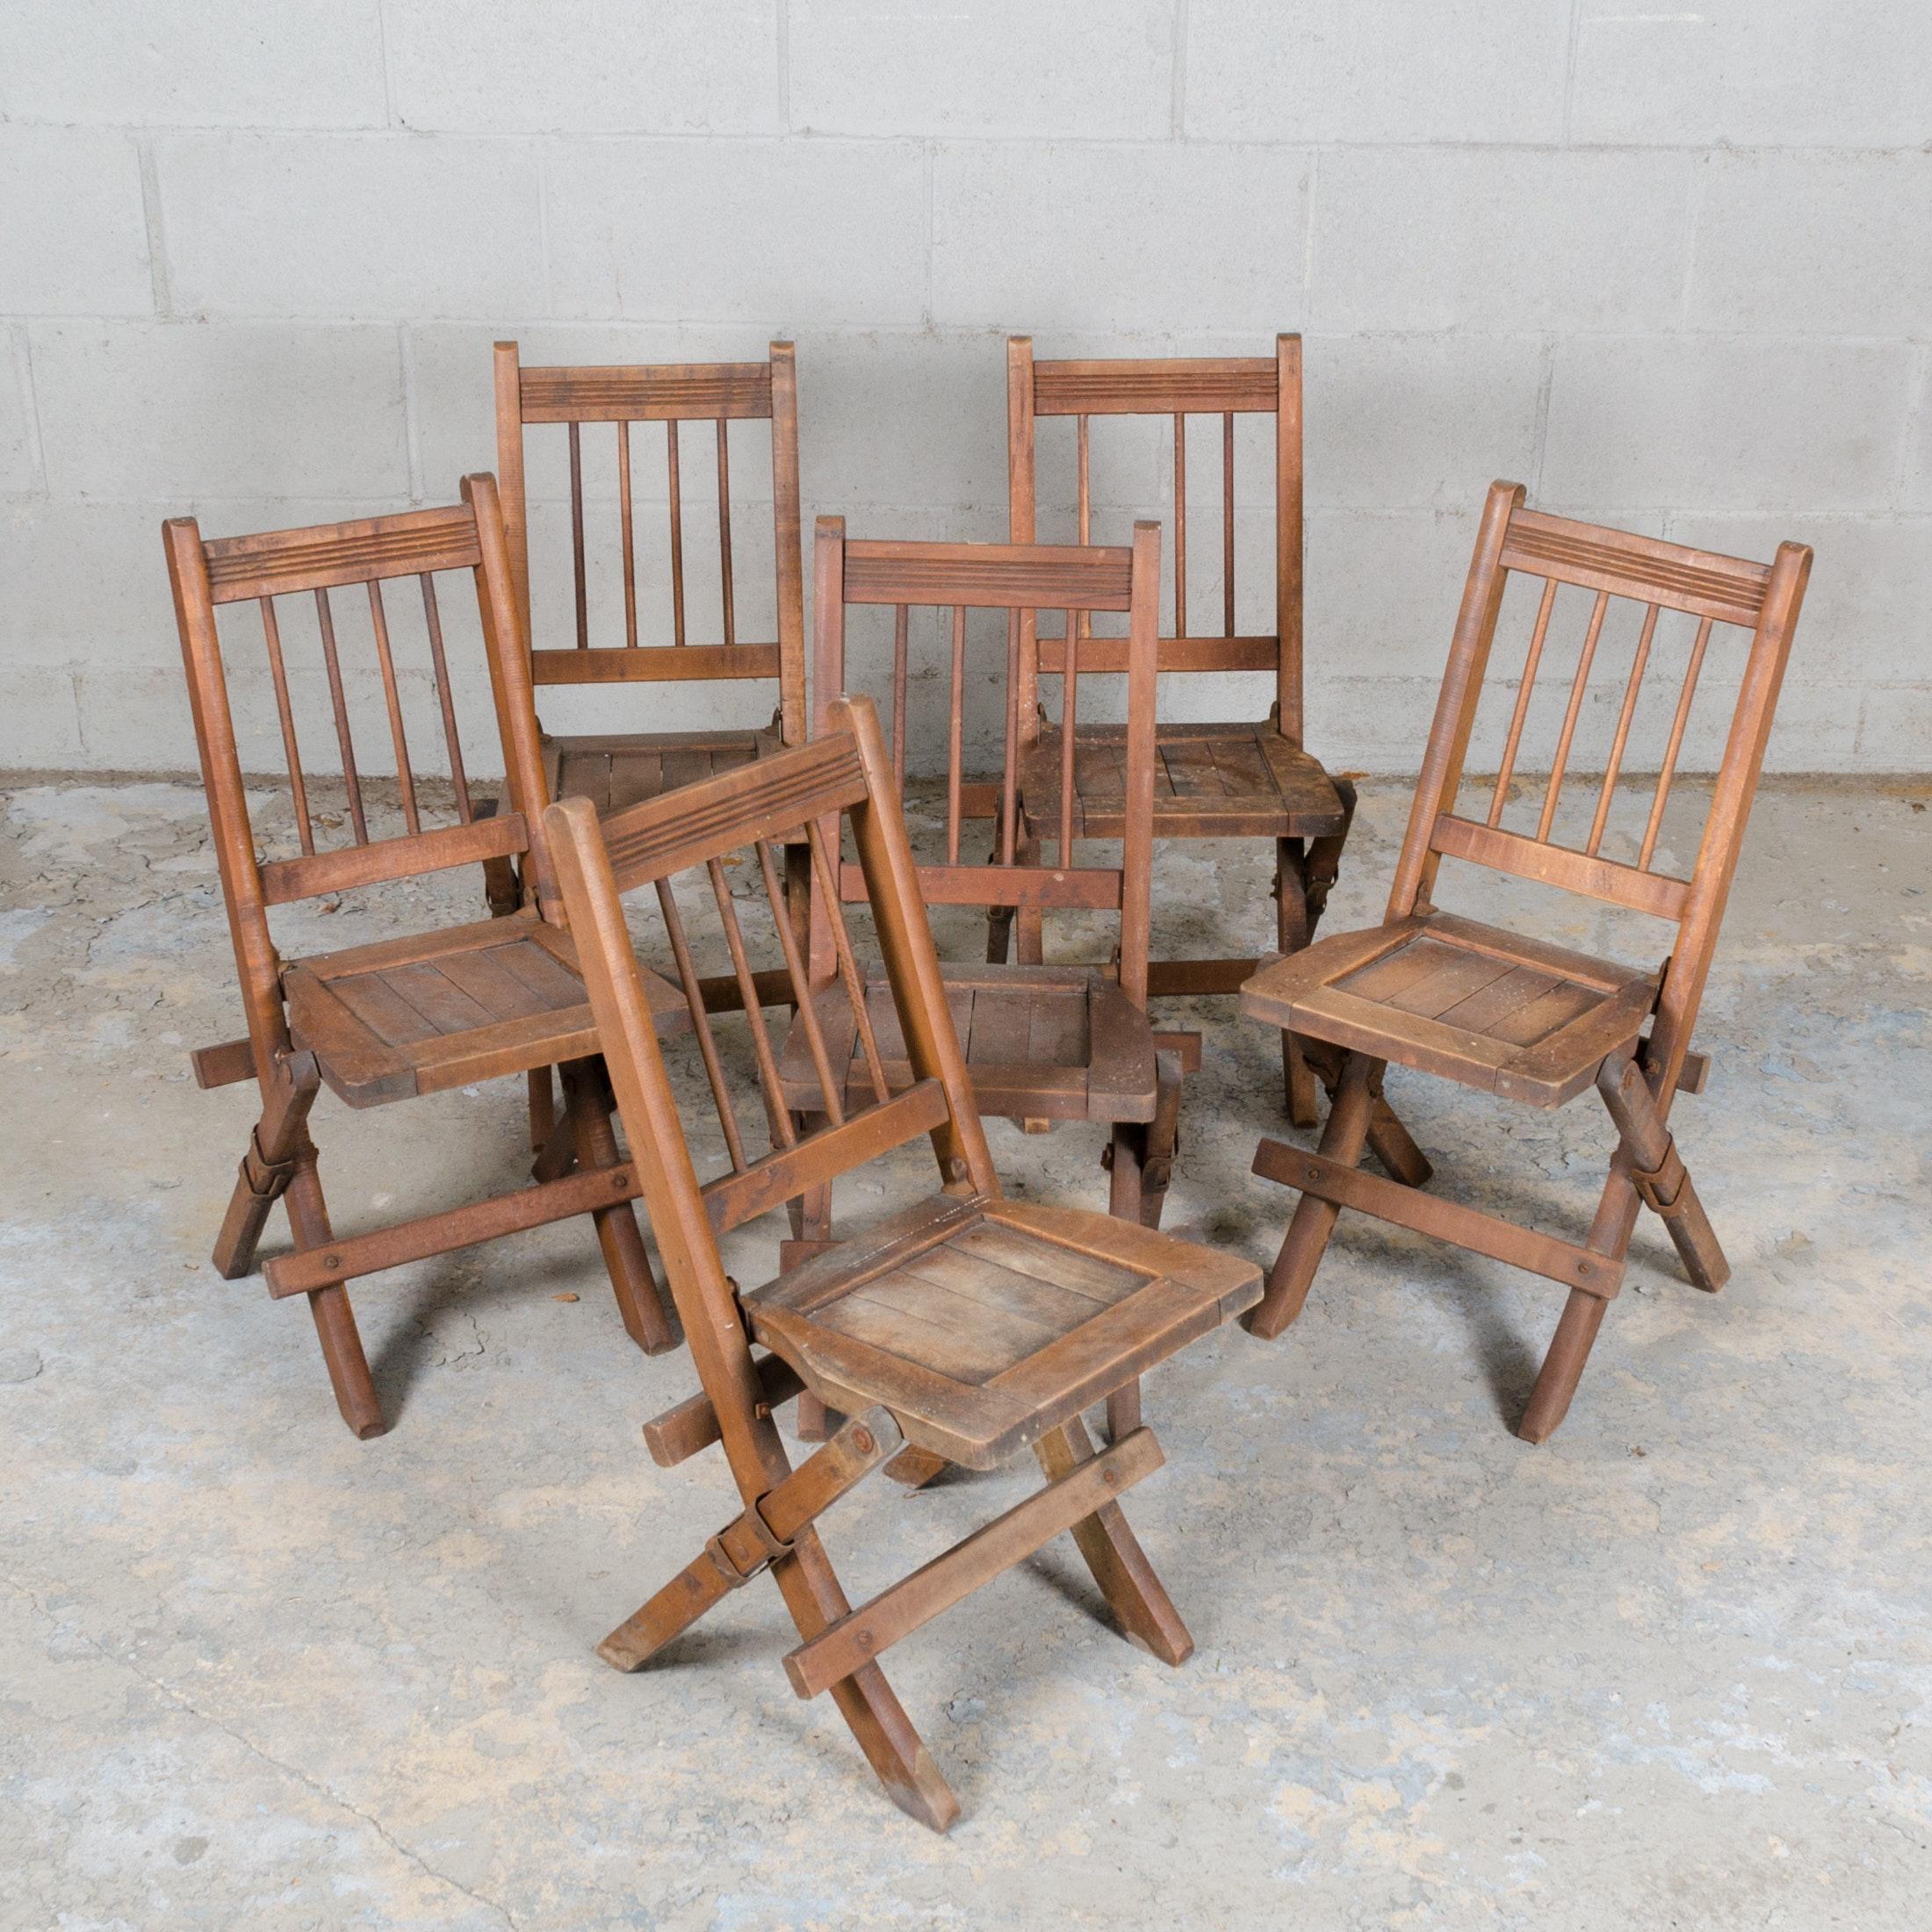 Vintage Child Sized Wood Folding Chairs ...